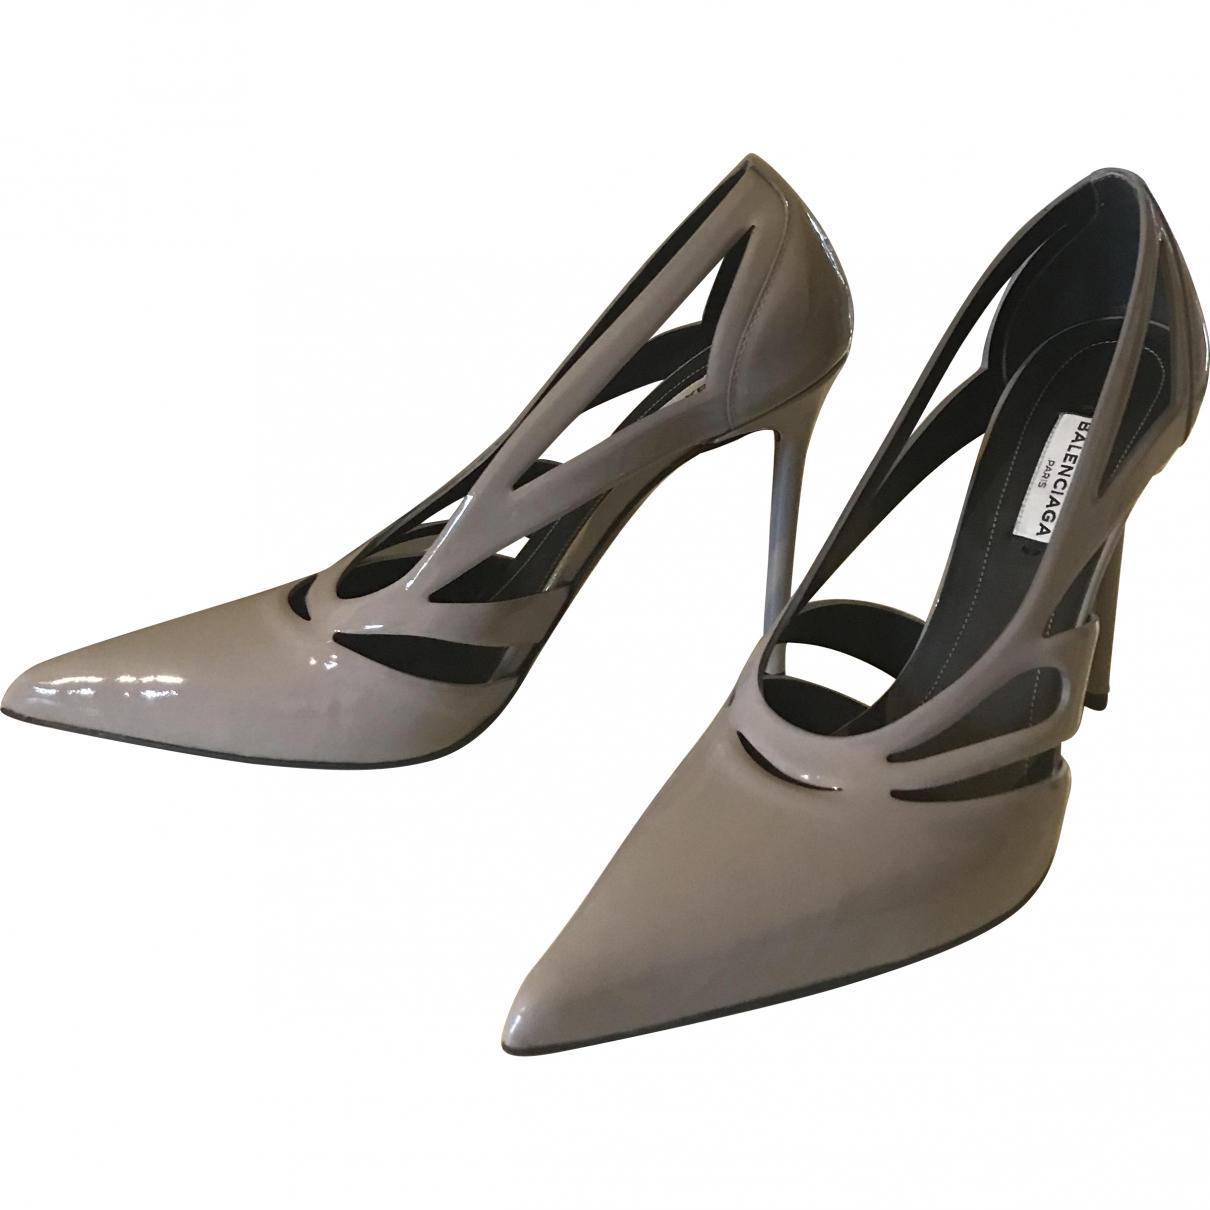 Balenciaga - Escarpins   pour femme en cuir verni - gris